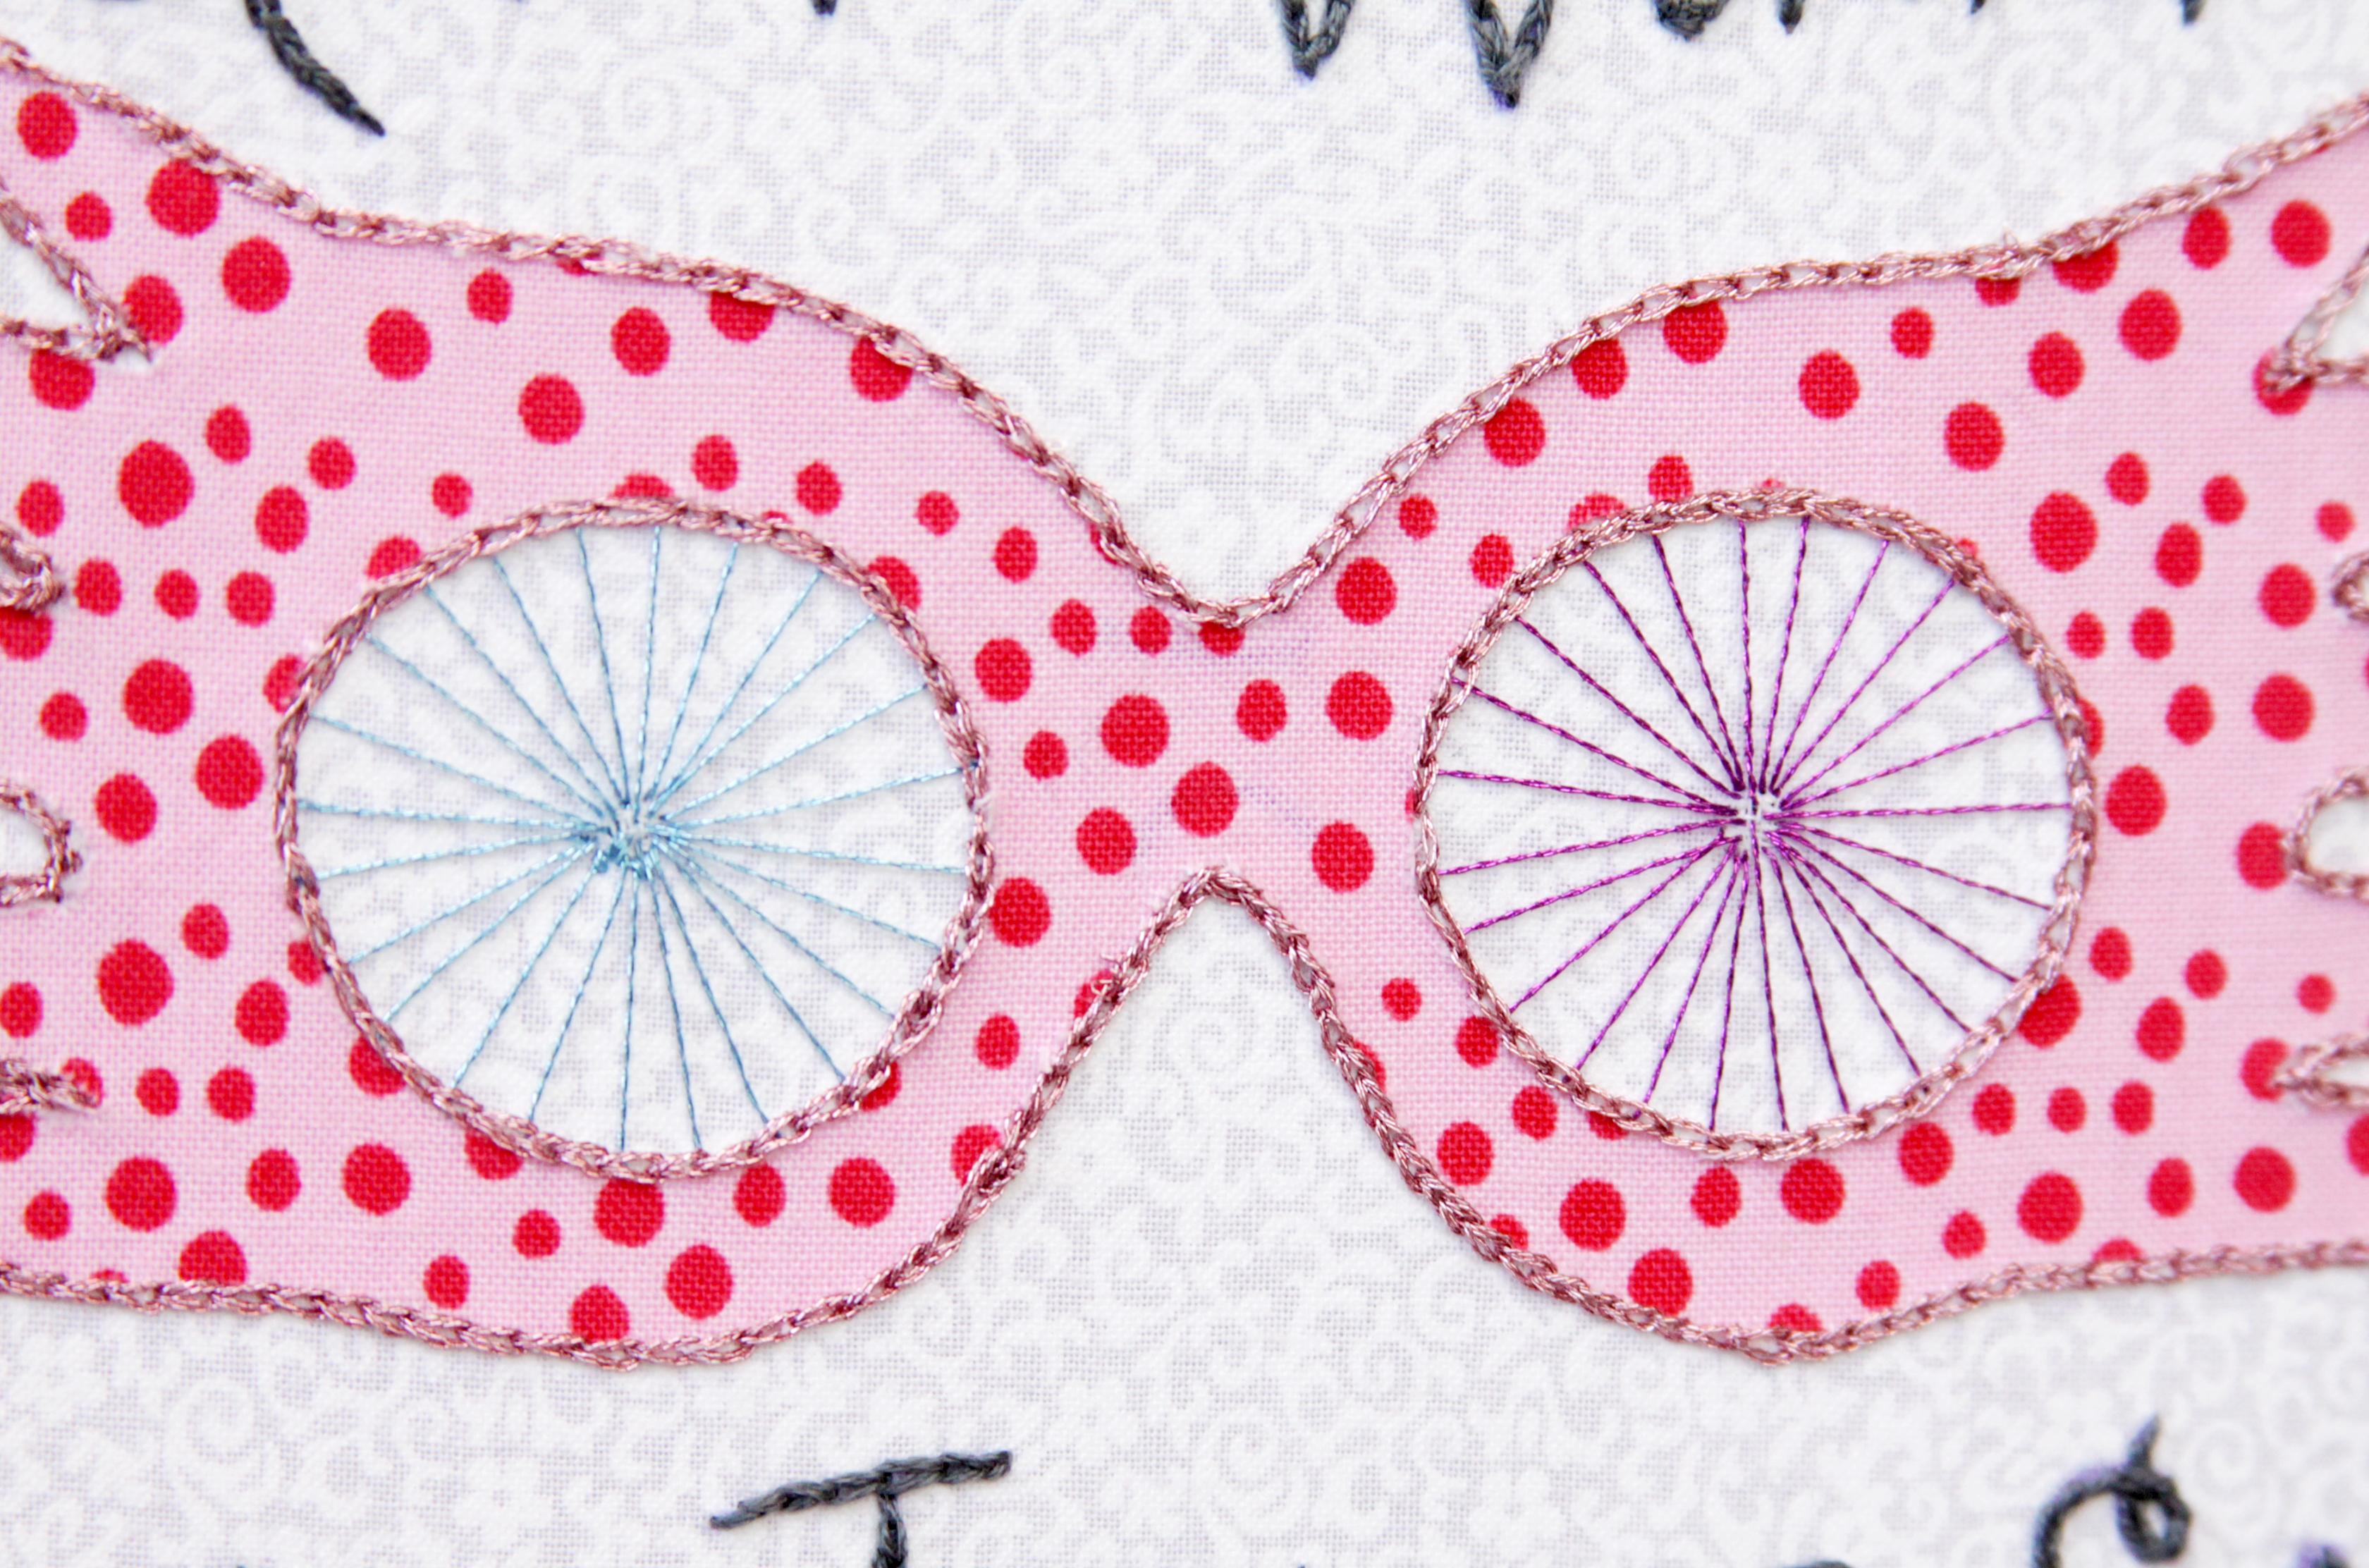 Luna Spectrespecs Embroidery